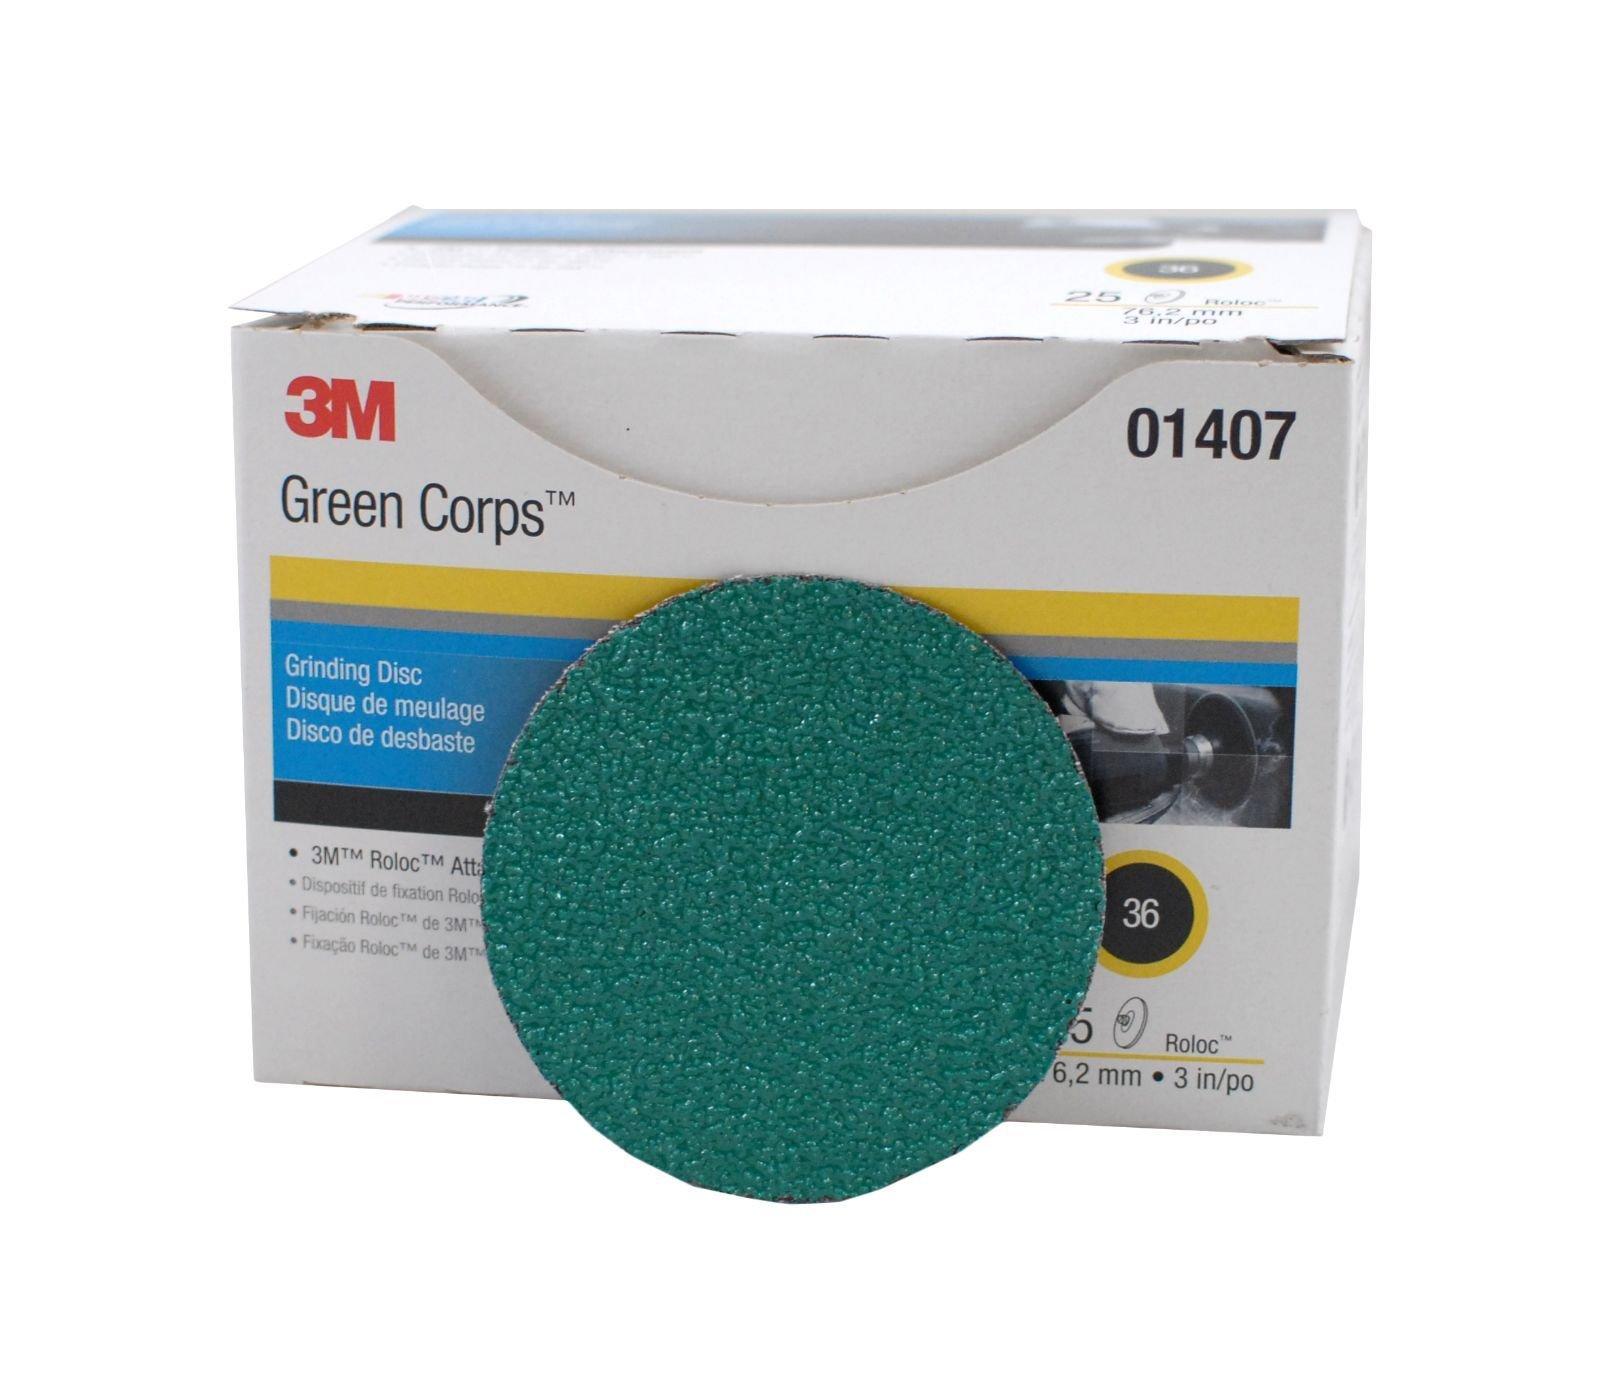 3'' Roloc 36 Grit Grinding Discs _ 25 Pk. Brown